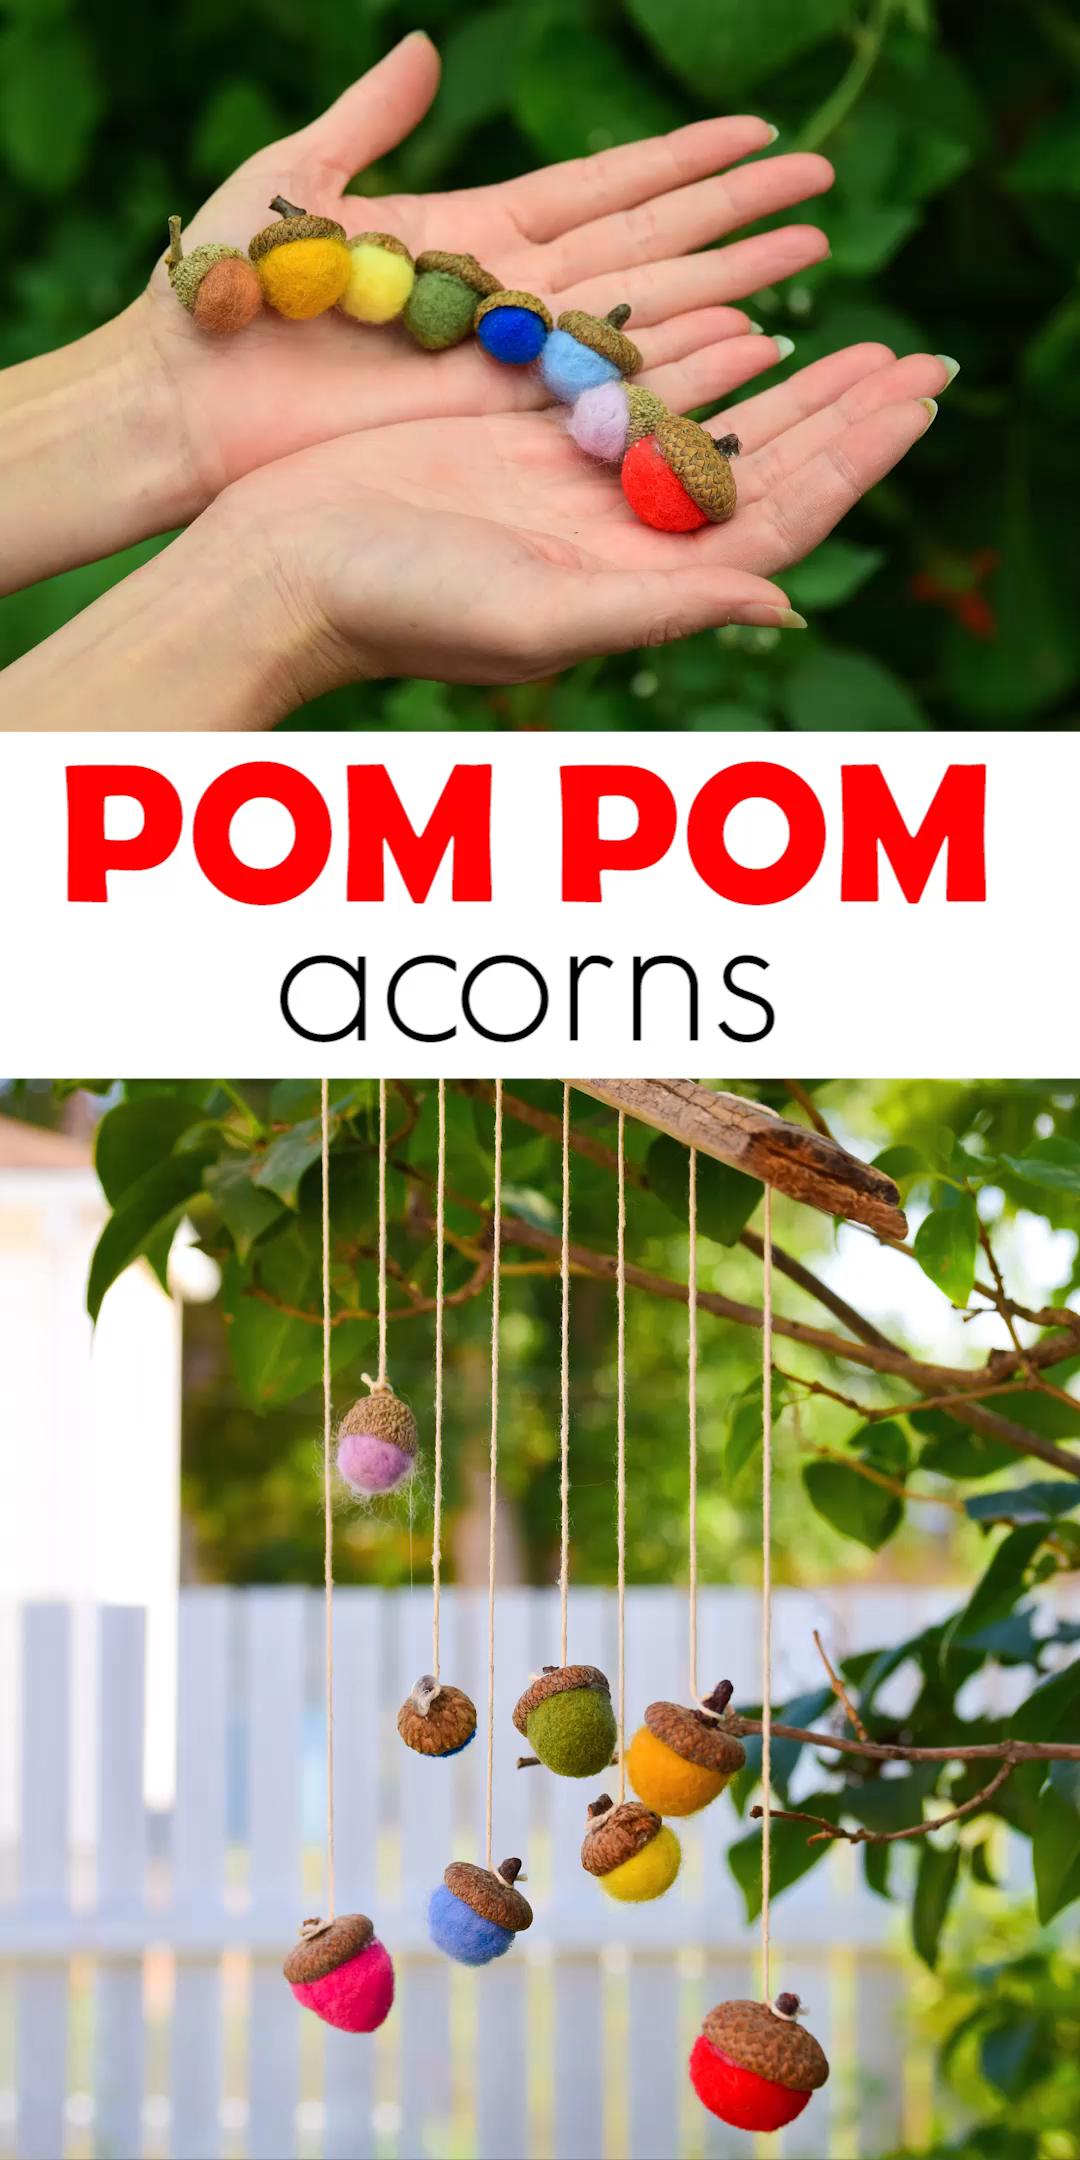 Pom Pom Acorn Craft